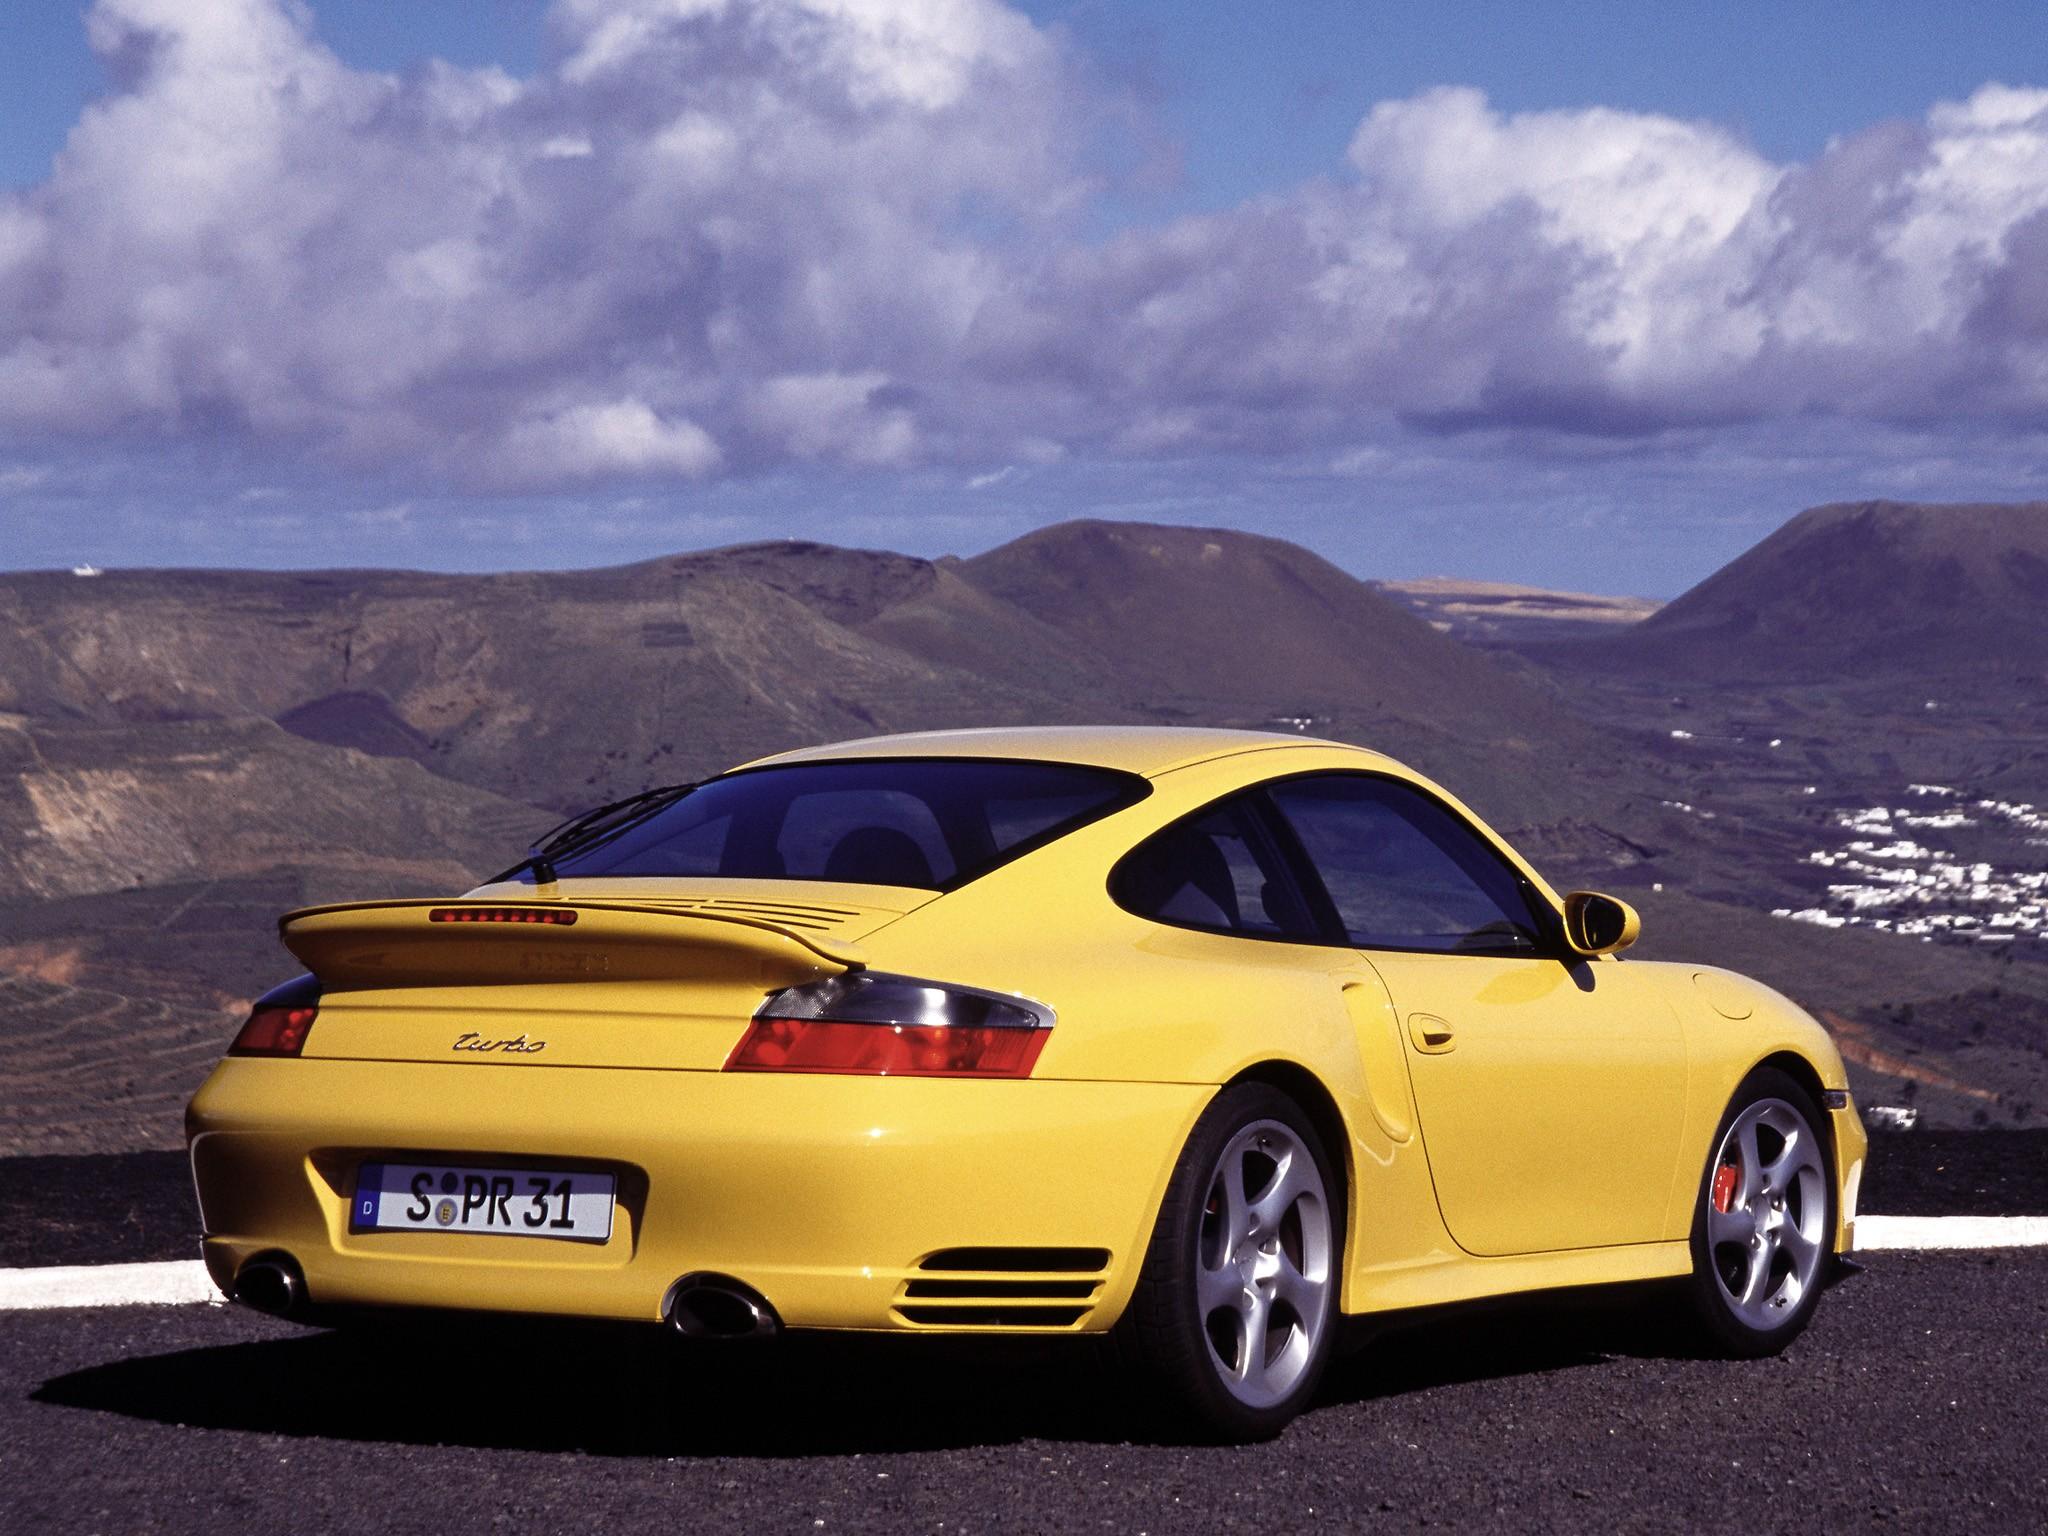 PORSCHE 911 Turbo 996 2000 2001 2002 2003 2004